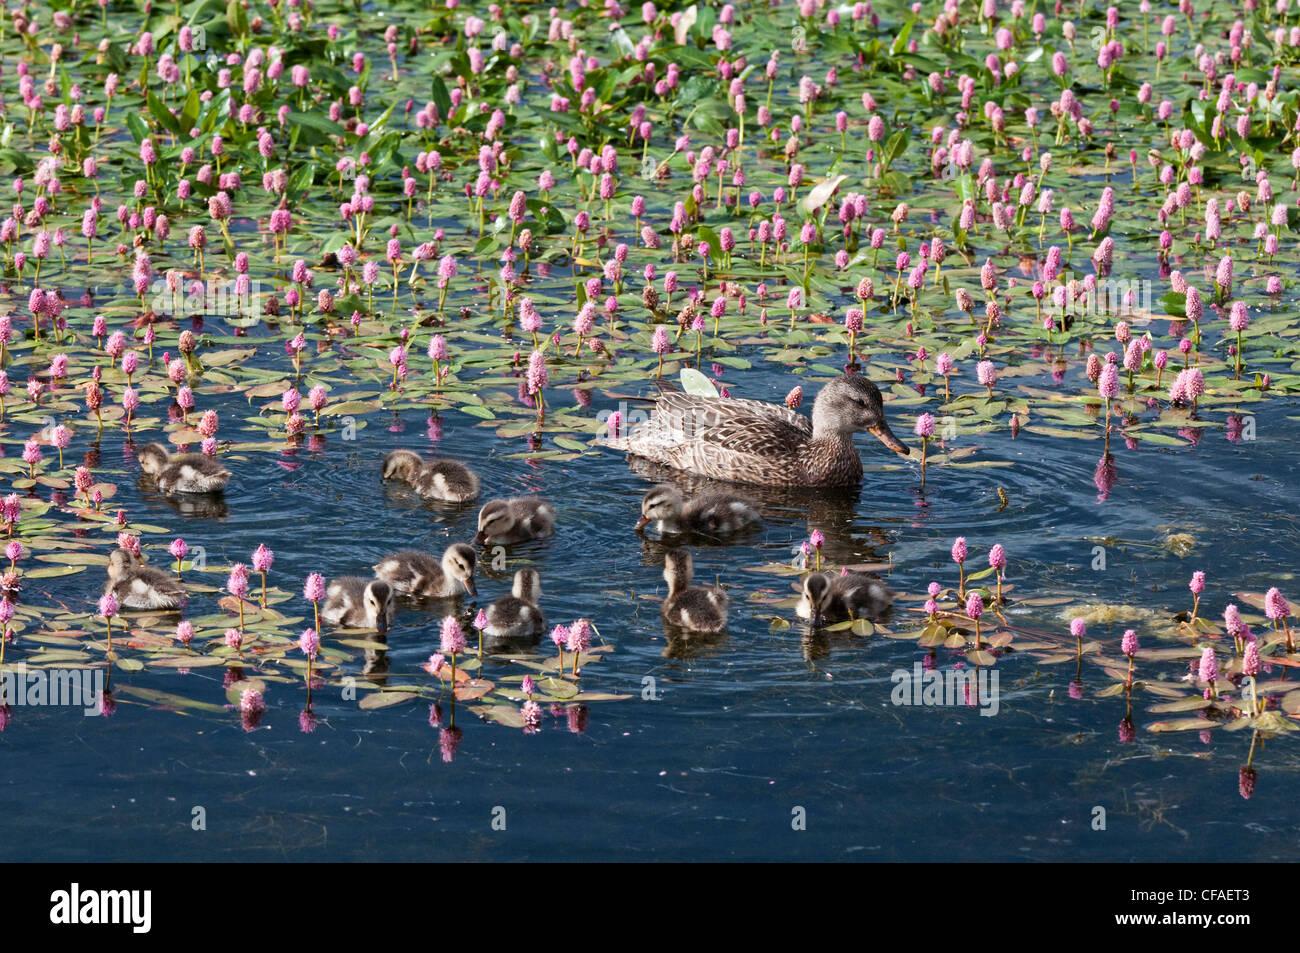 Gadwall (Anas strepera), female and ducklings among water smartweed (Polygonum amphibium), near Walden, Colorado. - Stock Image